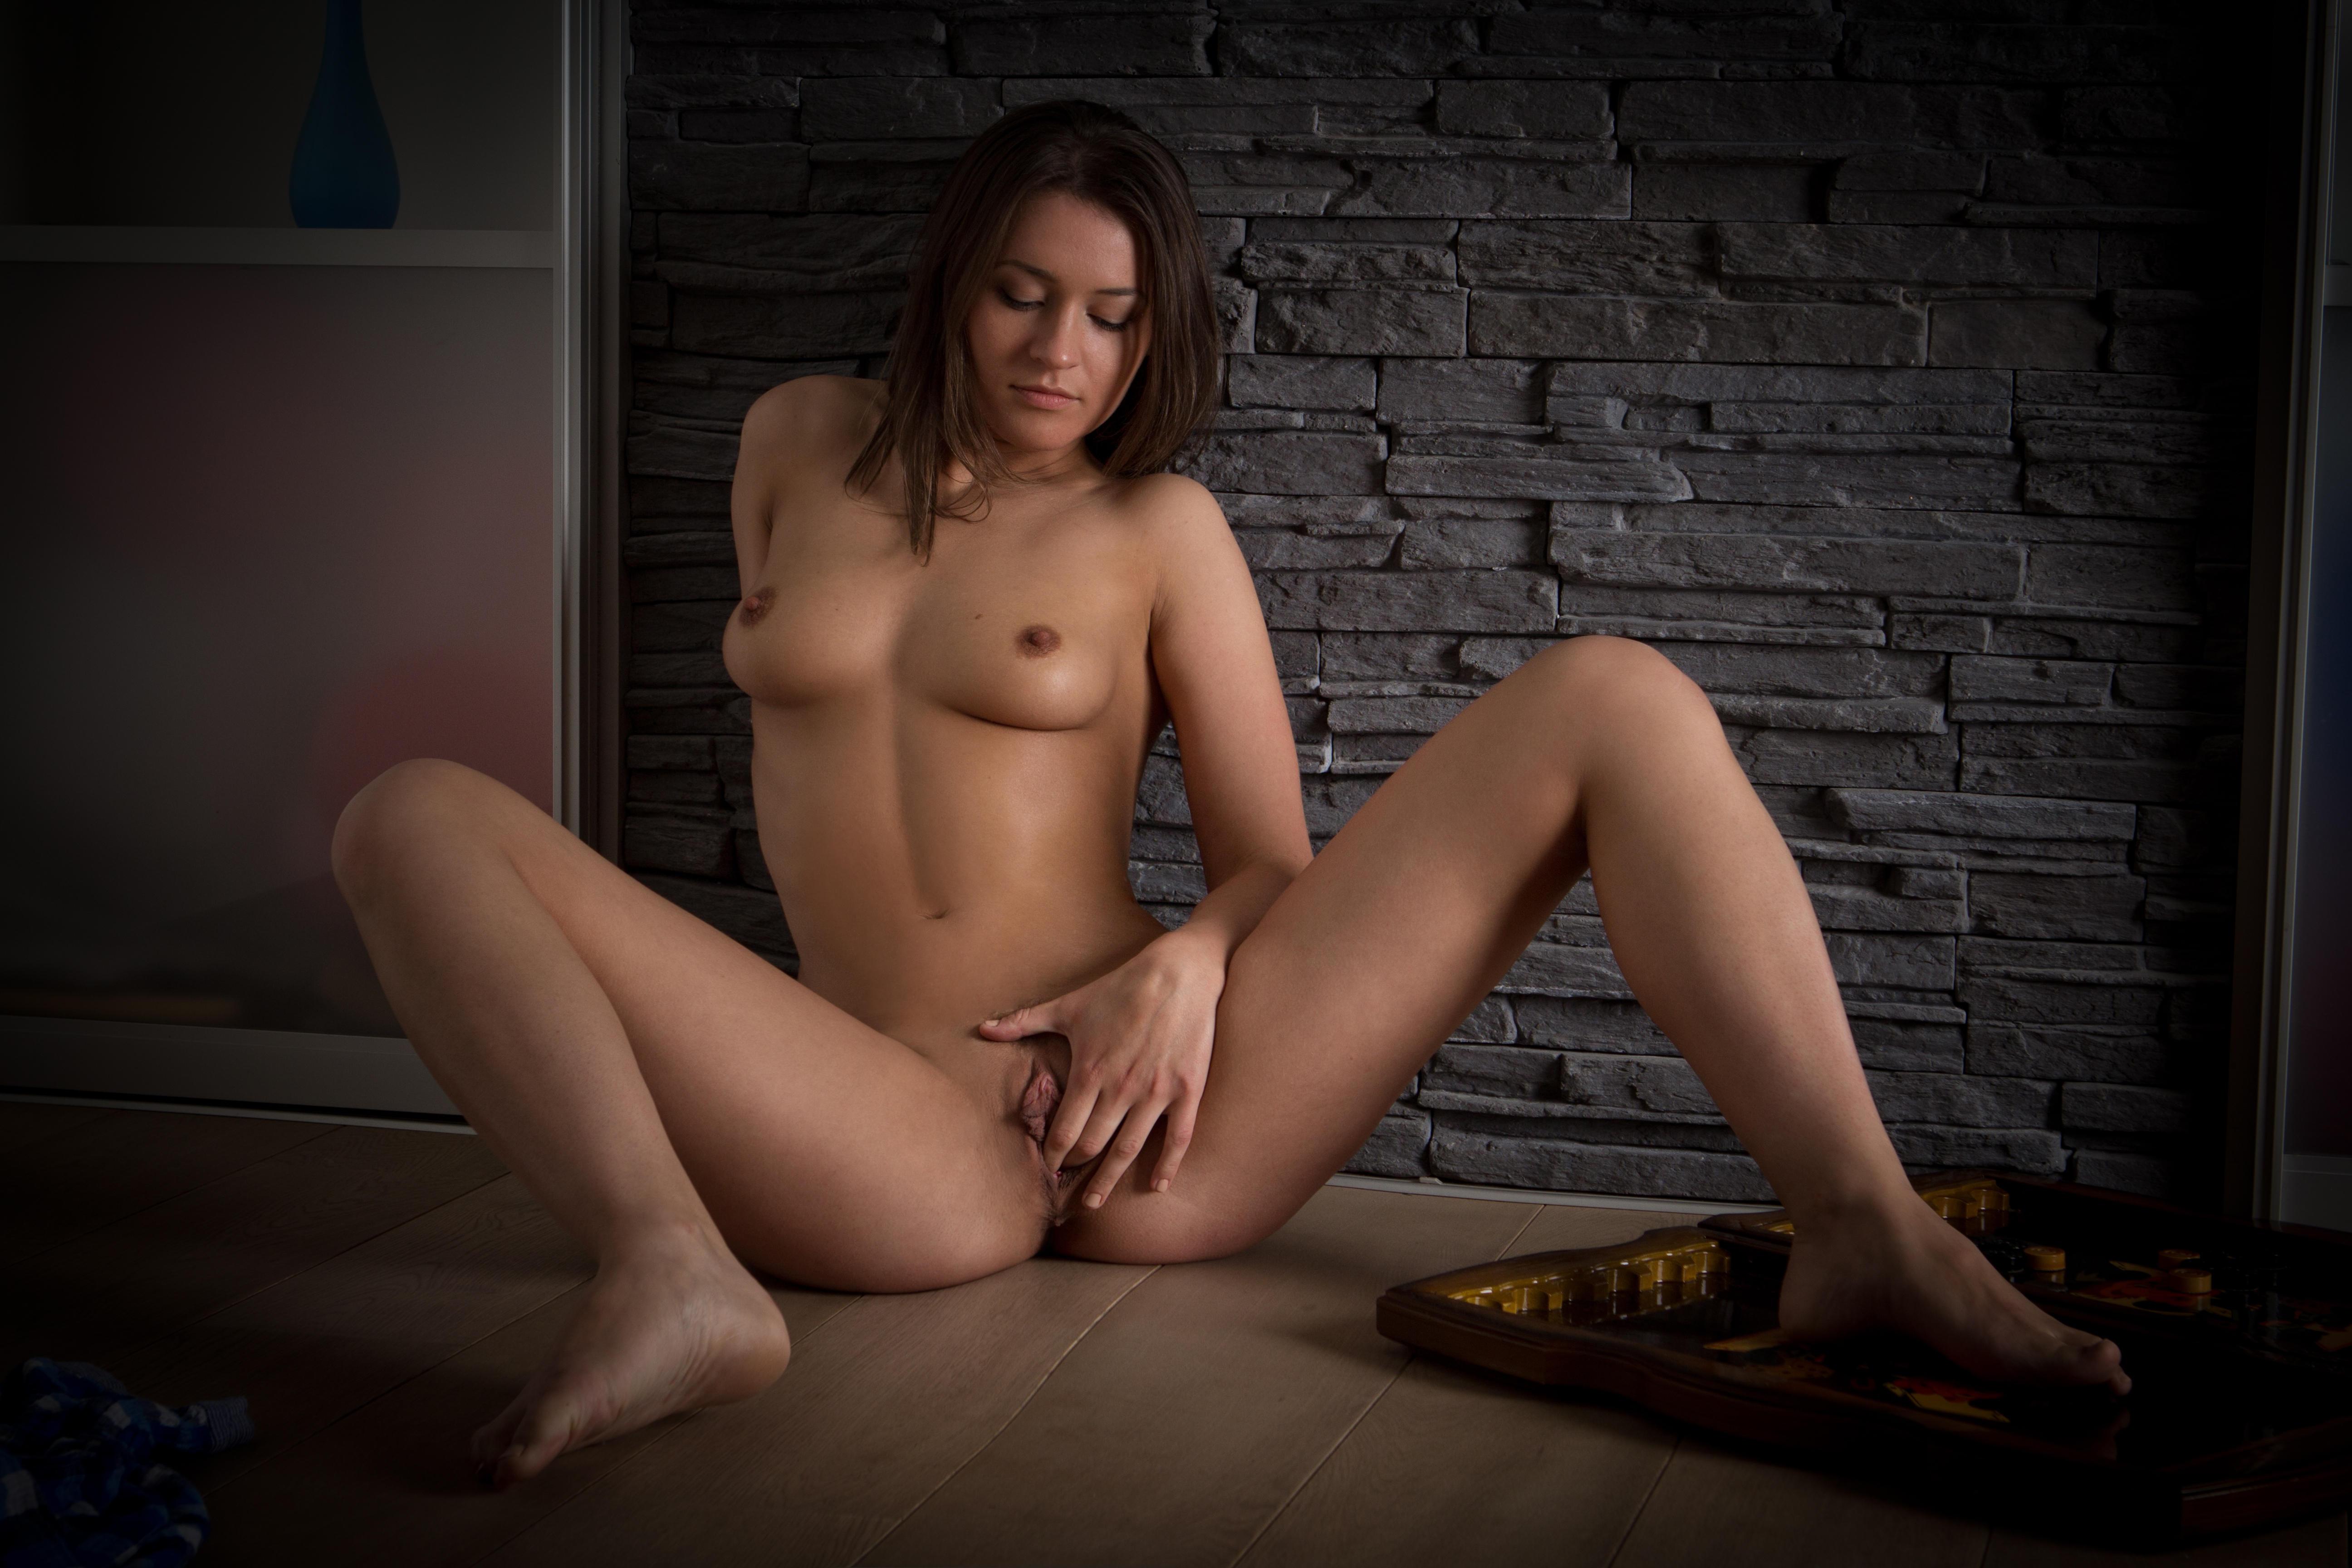 Holly Gibbons - Internet Models & Pornstars Forum